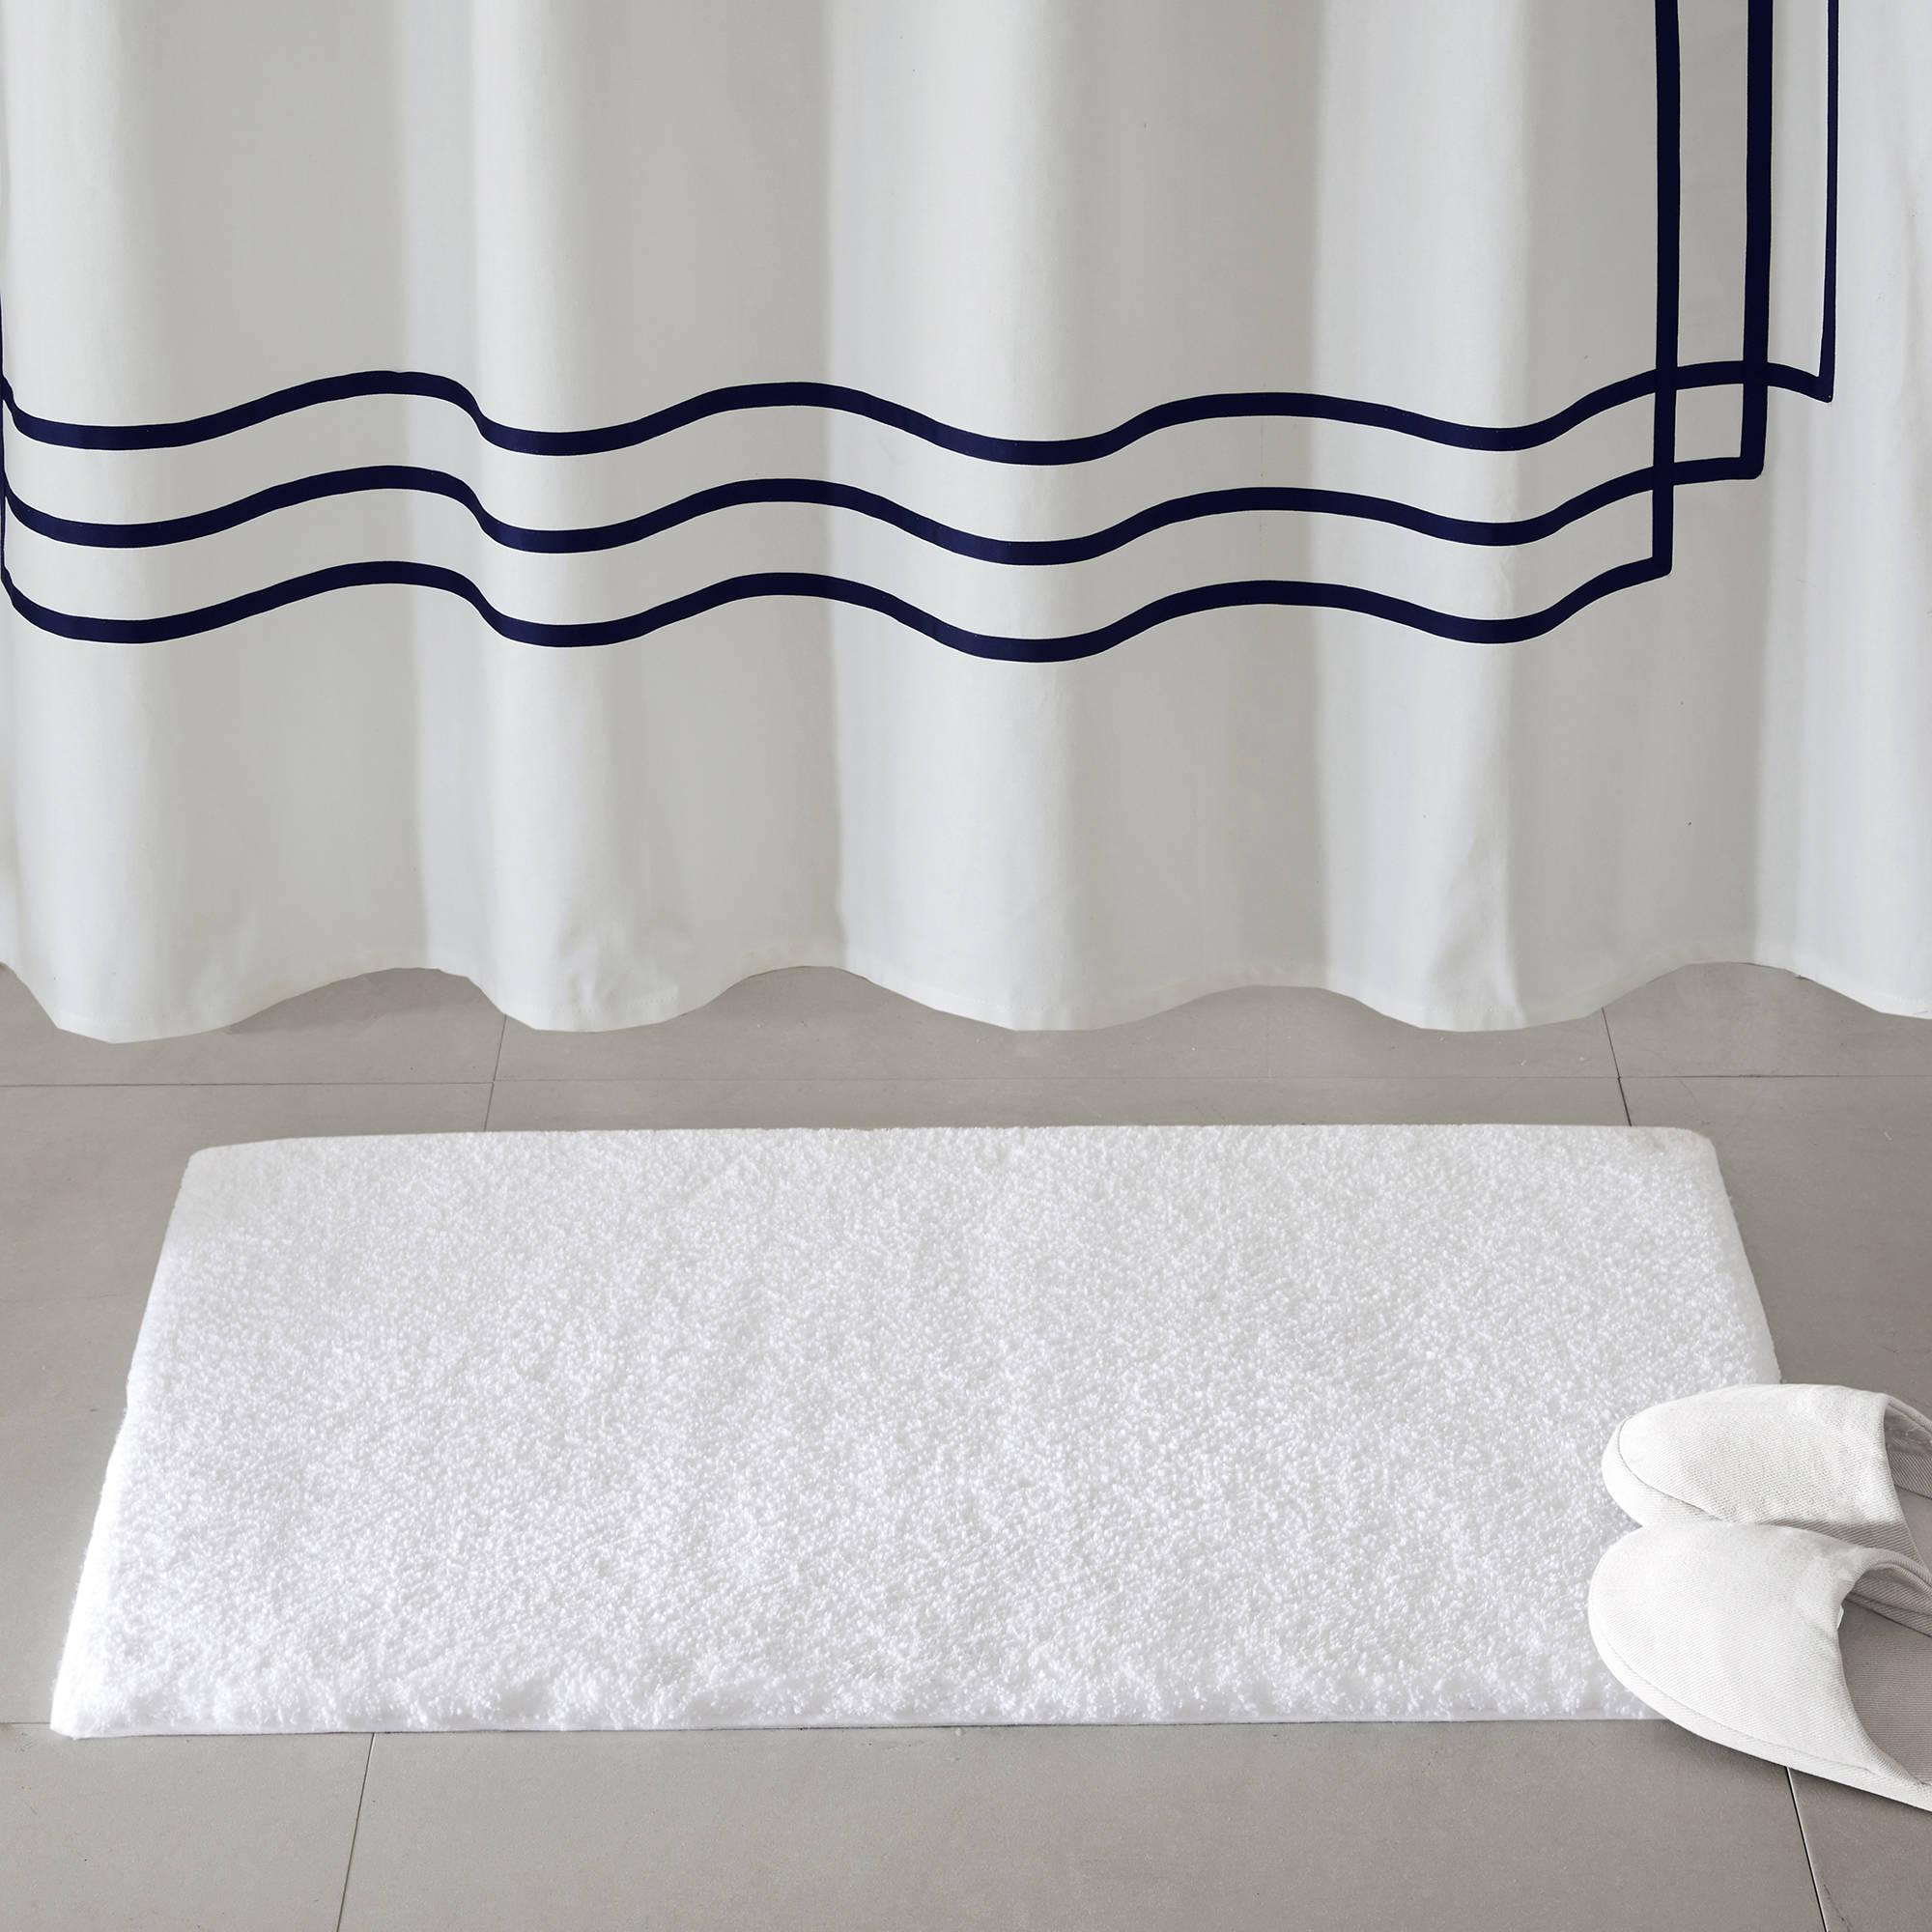 Home Essence Marshmallow Ultra Soft Microfiber Bath Rug